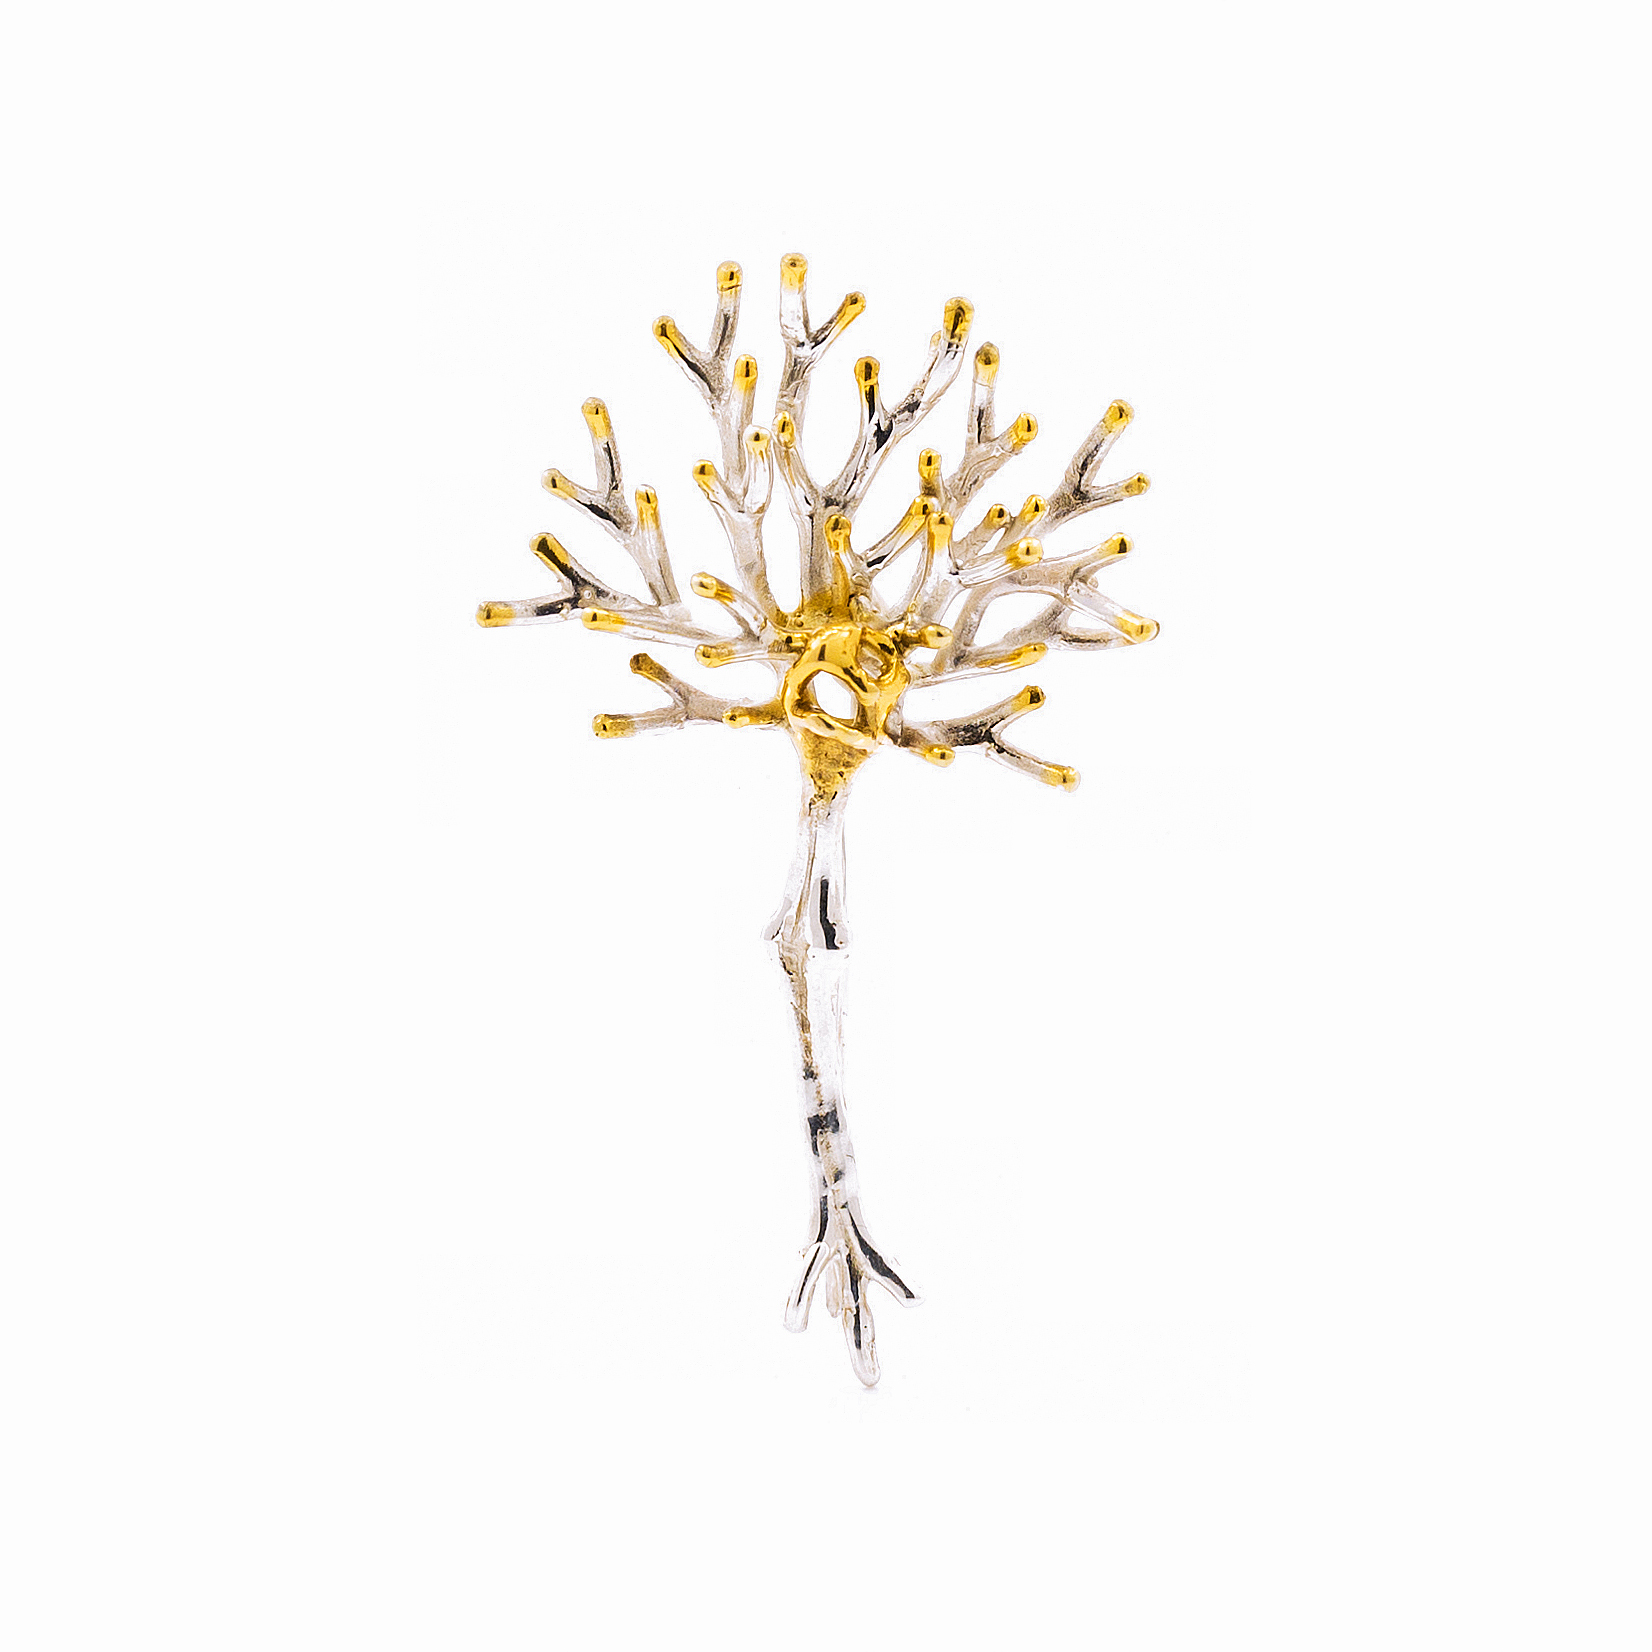 Neuron Pin | Sterling silver.